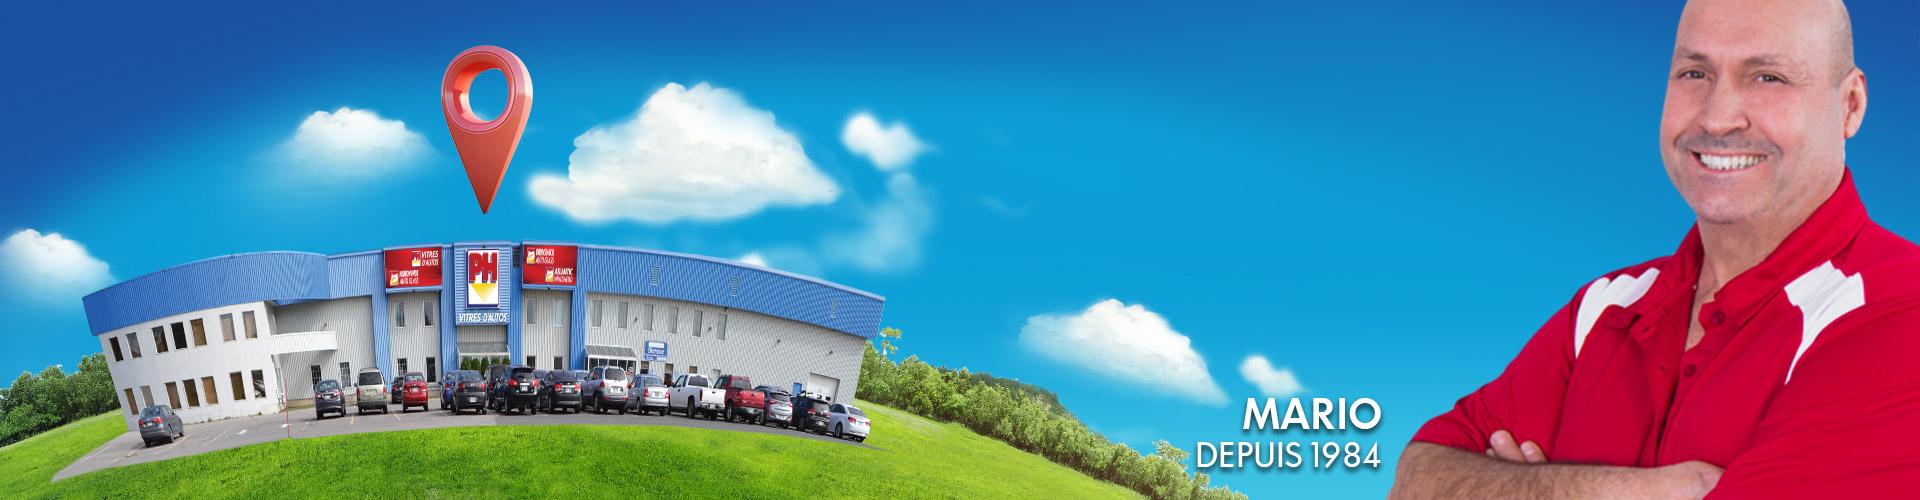 Header emploi installateur de vitres d'auto